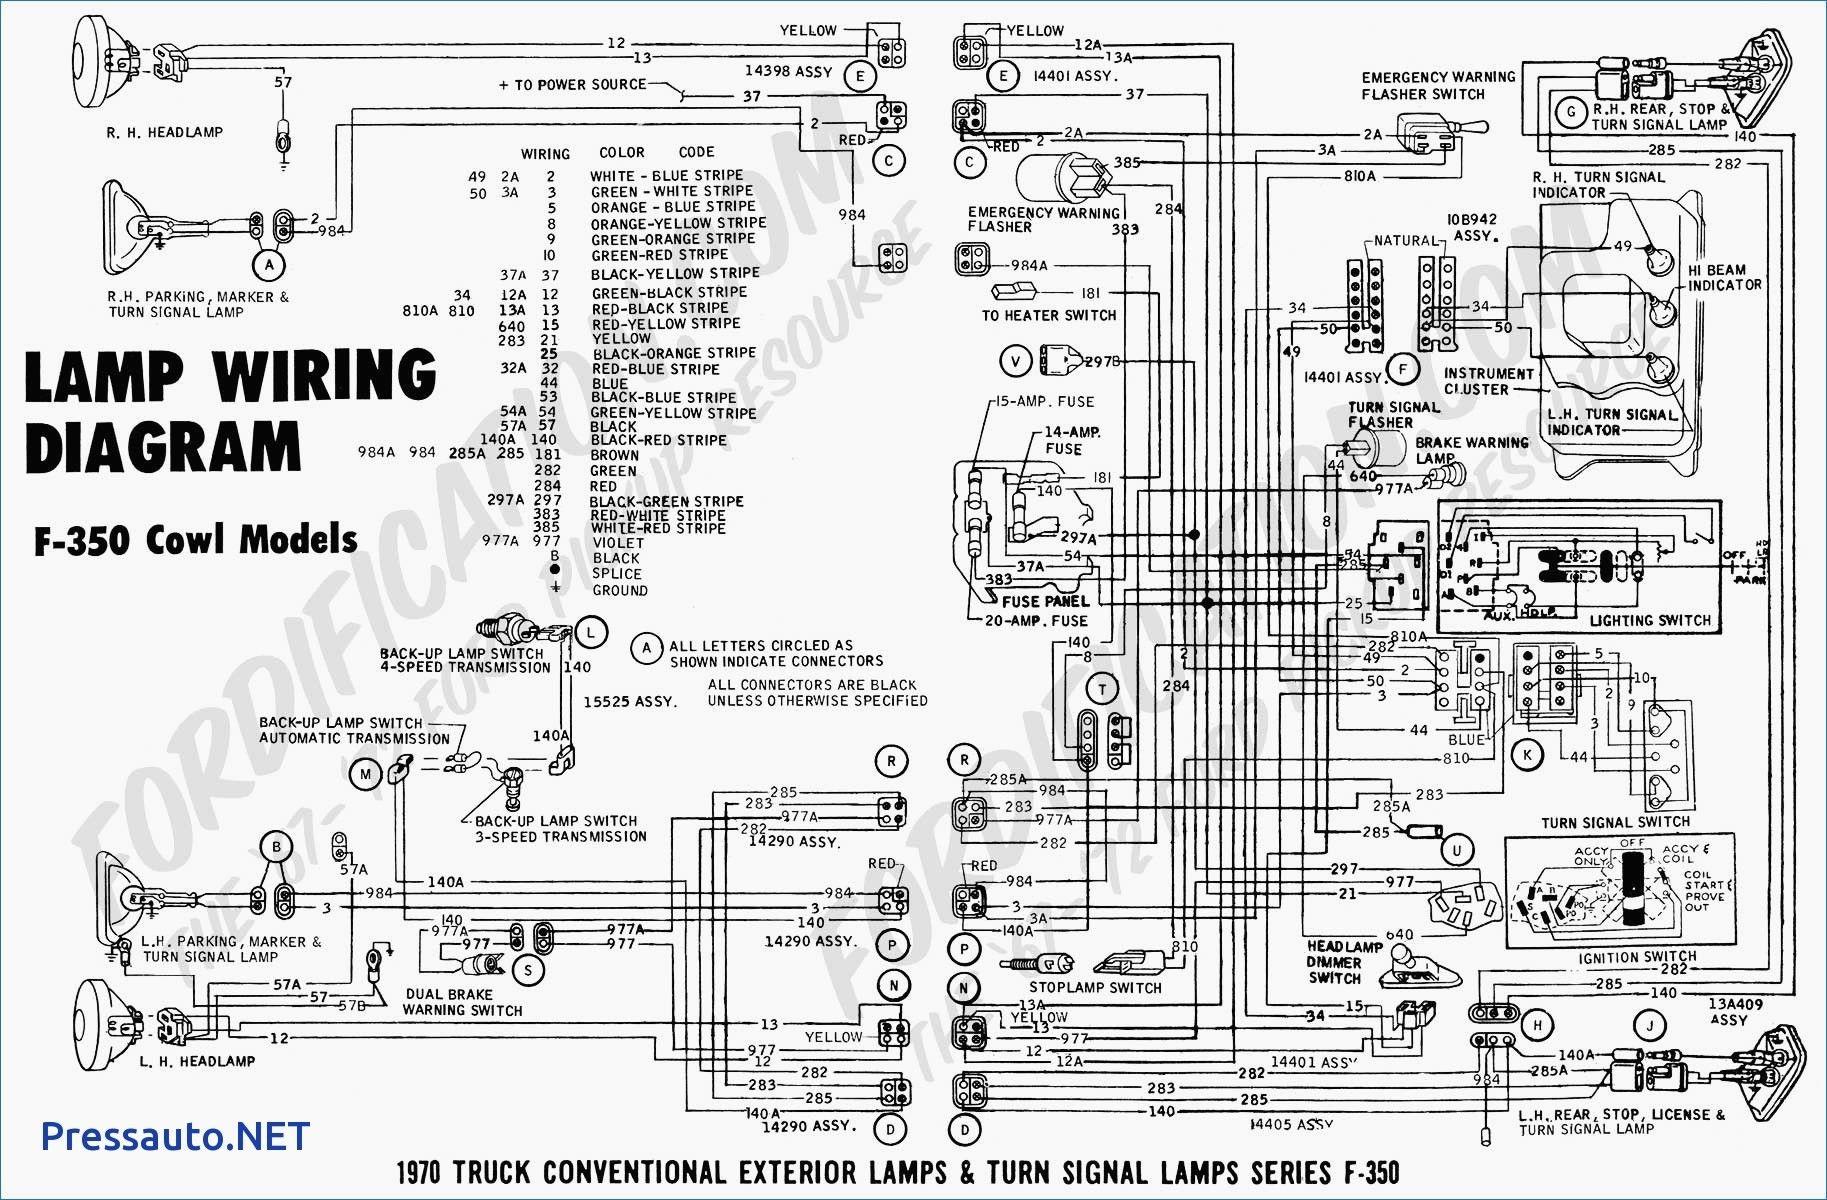 Ford Ranger 4 0 Engine Diagram In 2021 Diagram Ford Ranger Electrical Diagram